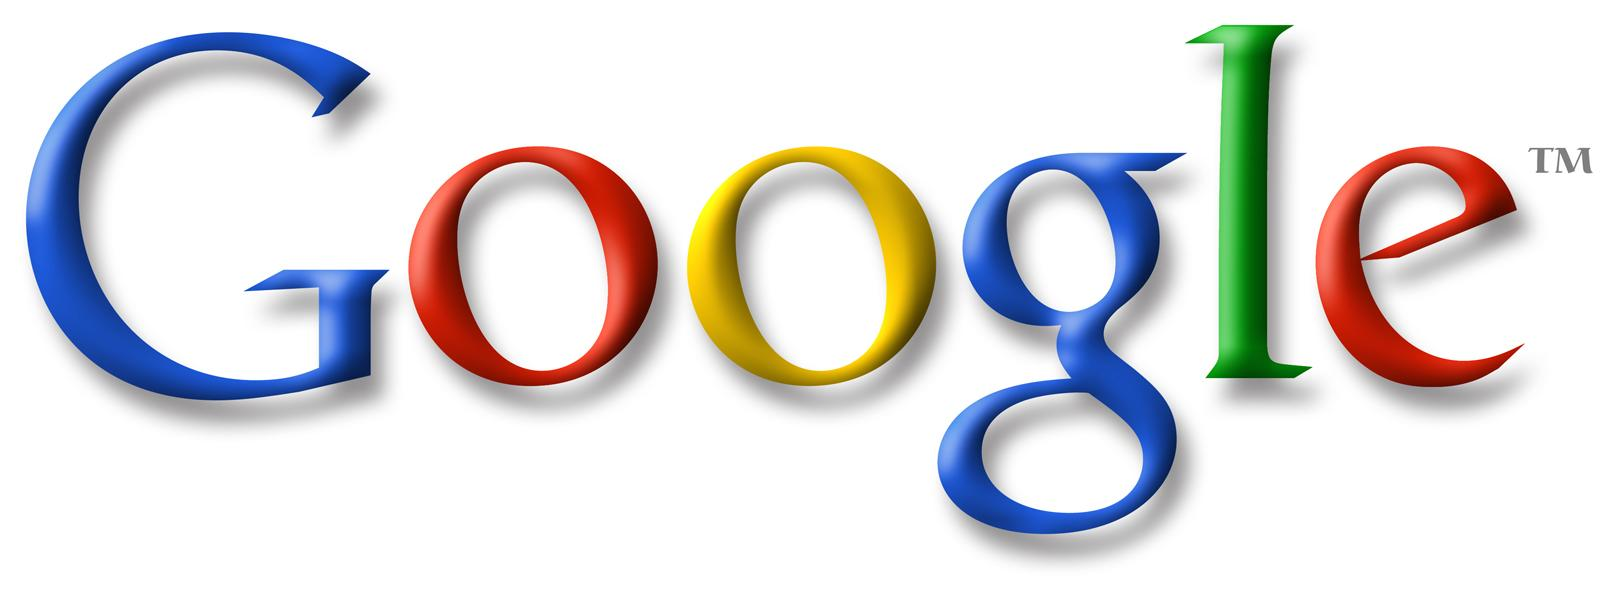 логотип компании гугл